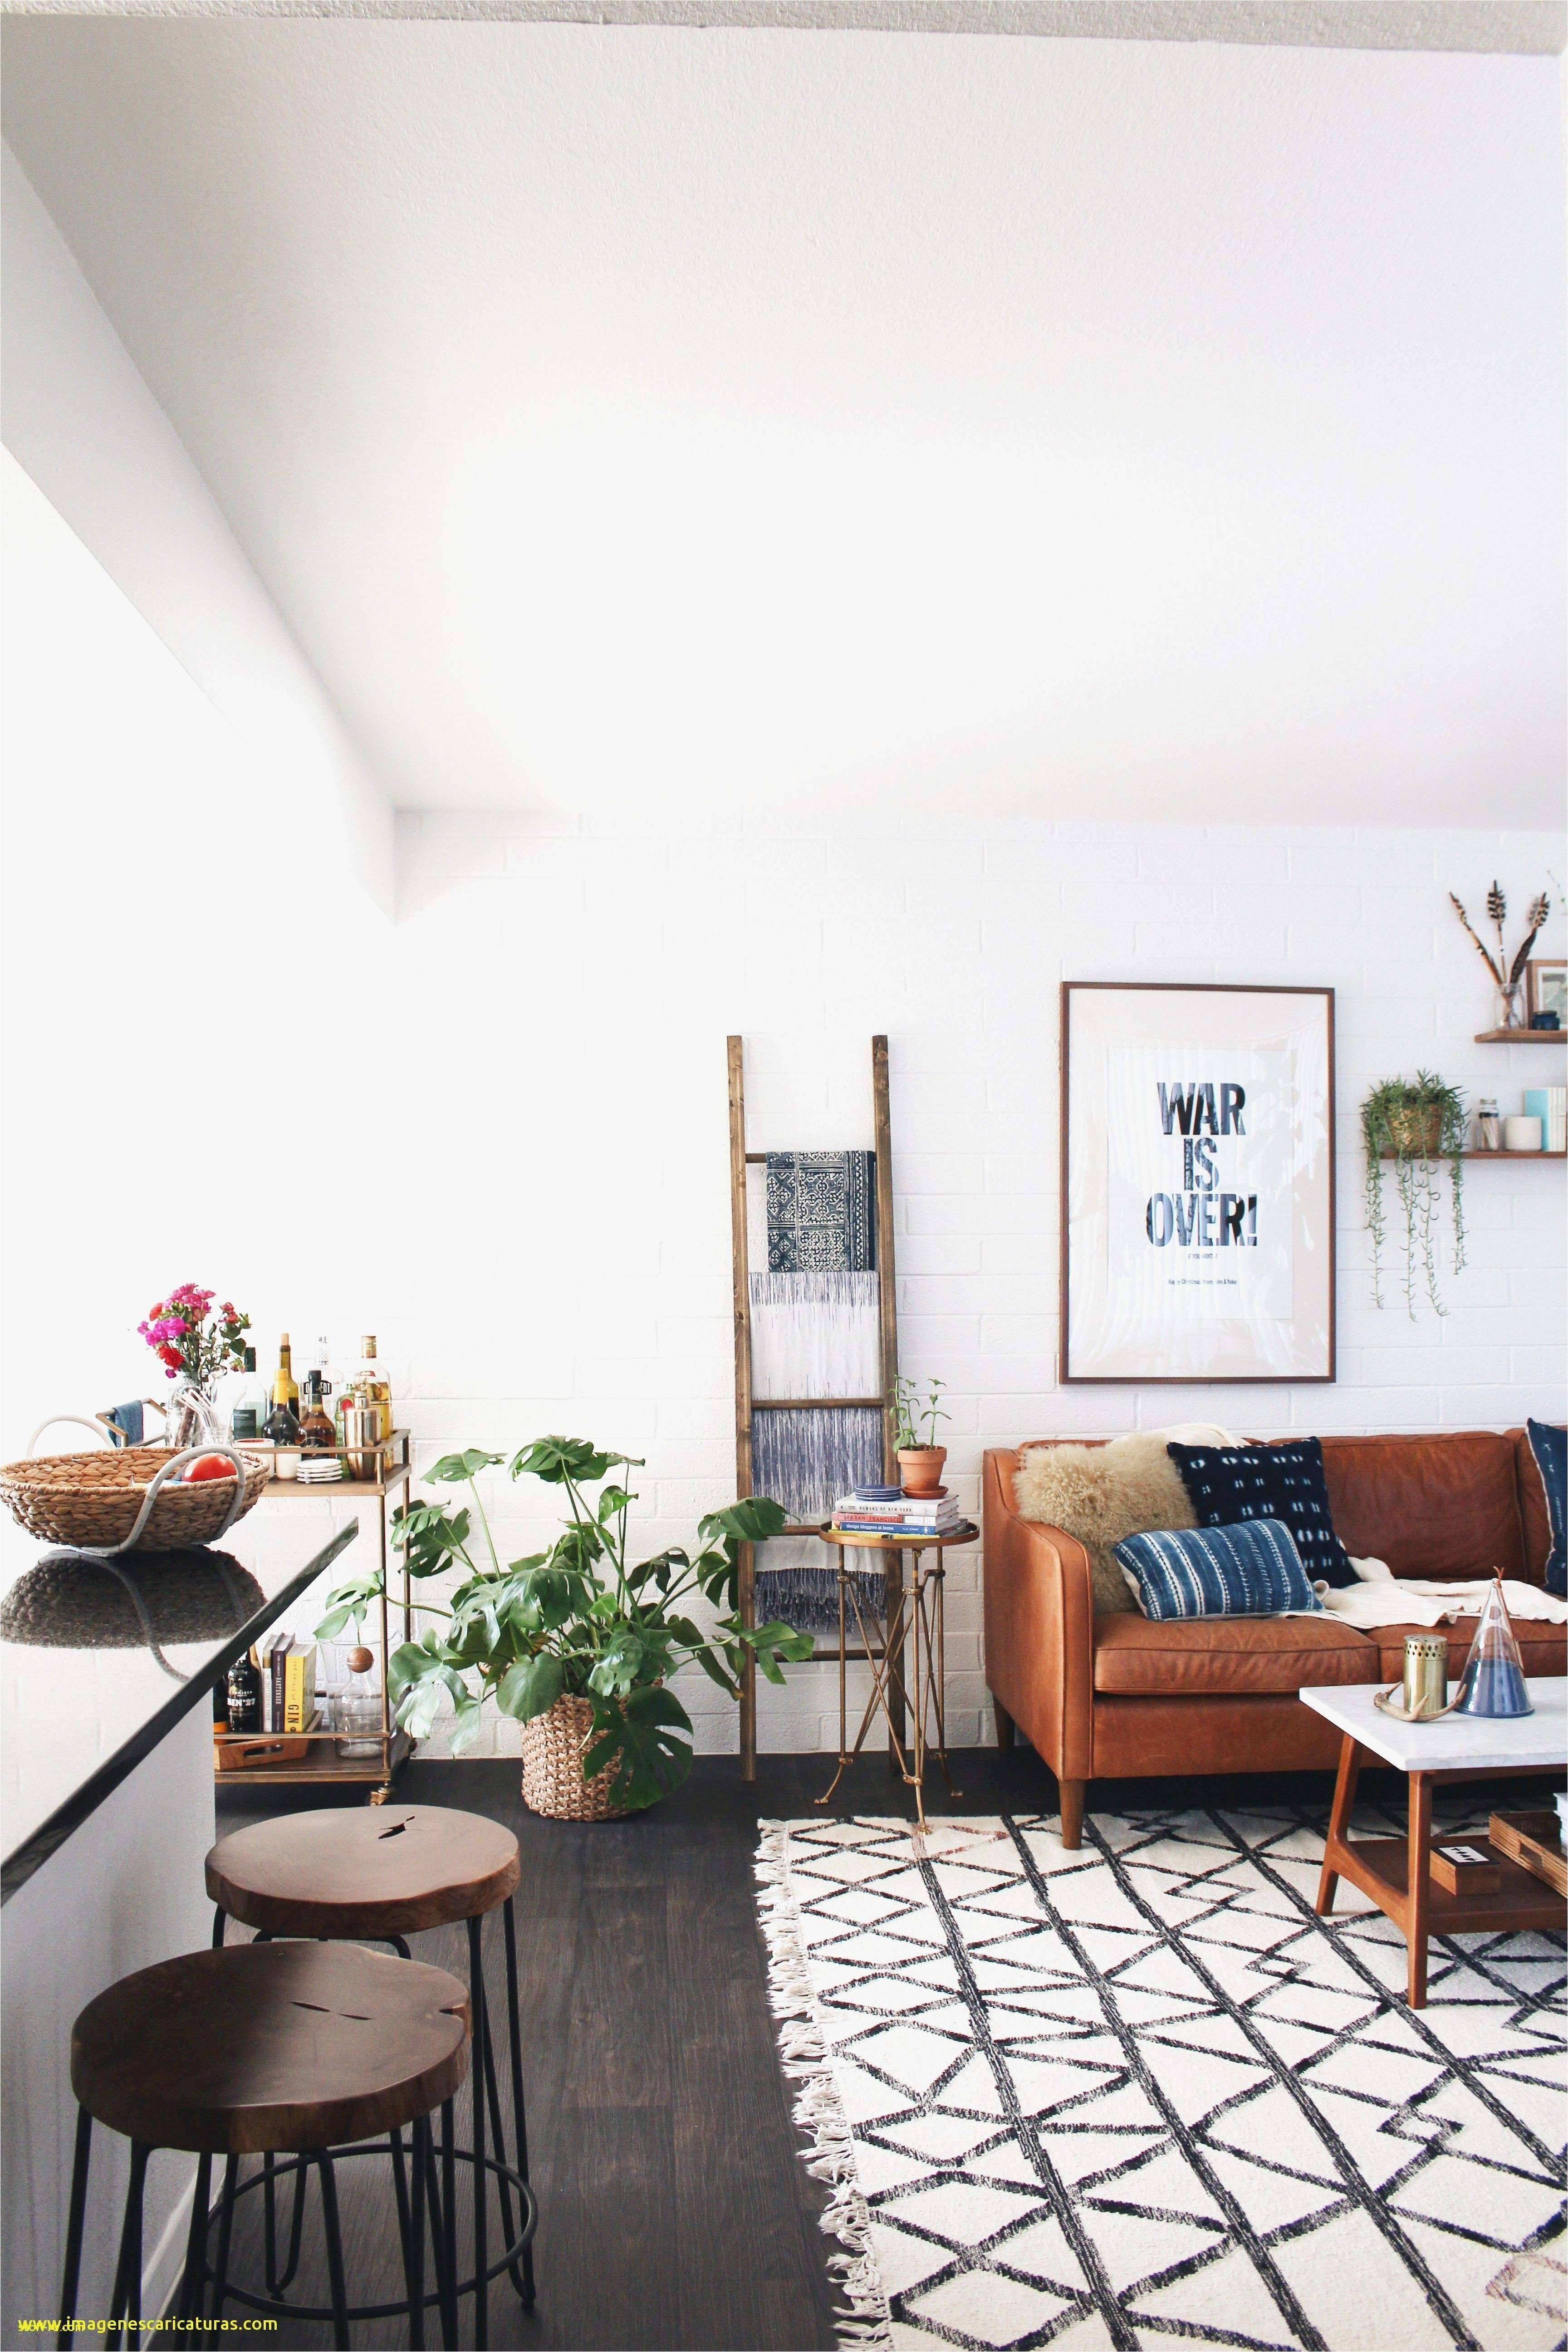 western decor stores 36 fresh beach house decor ideas inspiring home decor of western decor stores